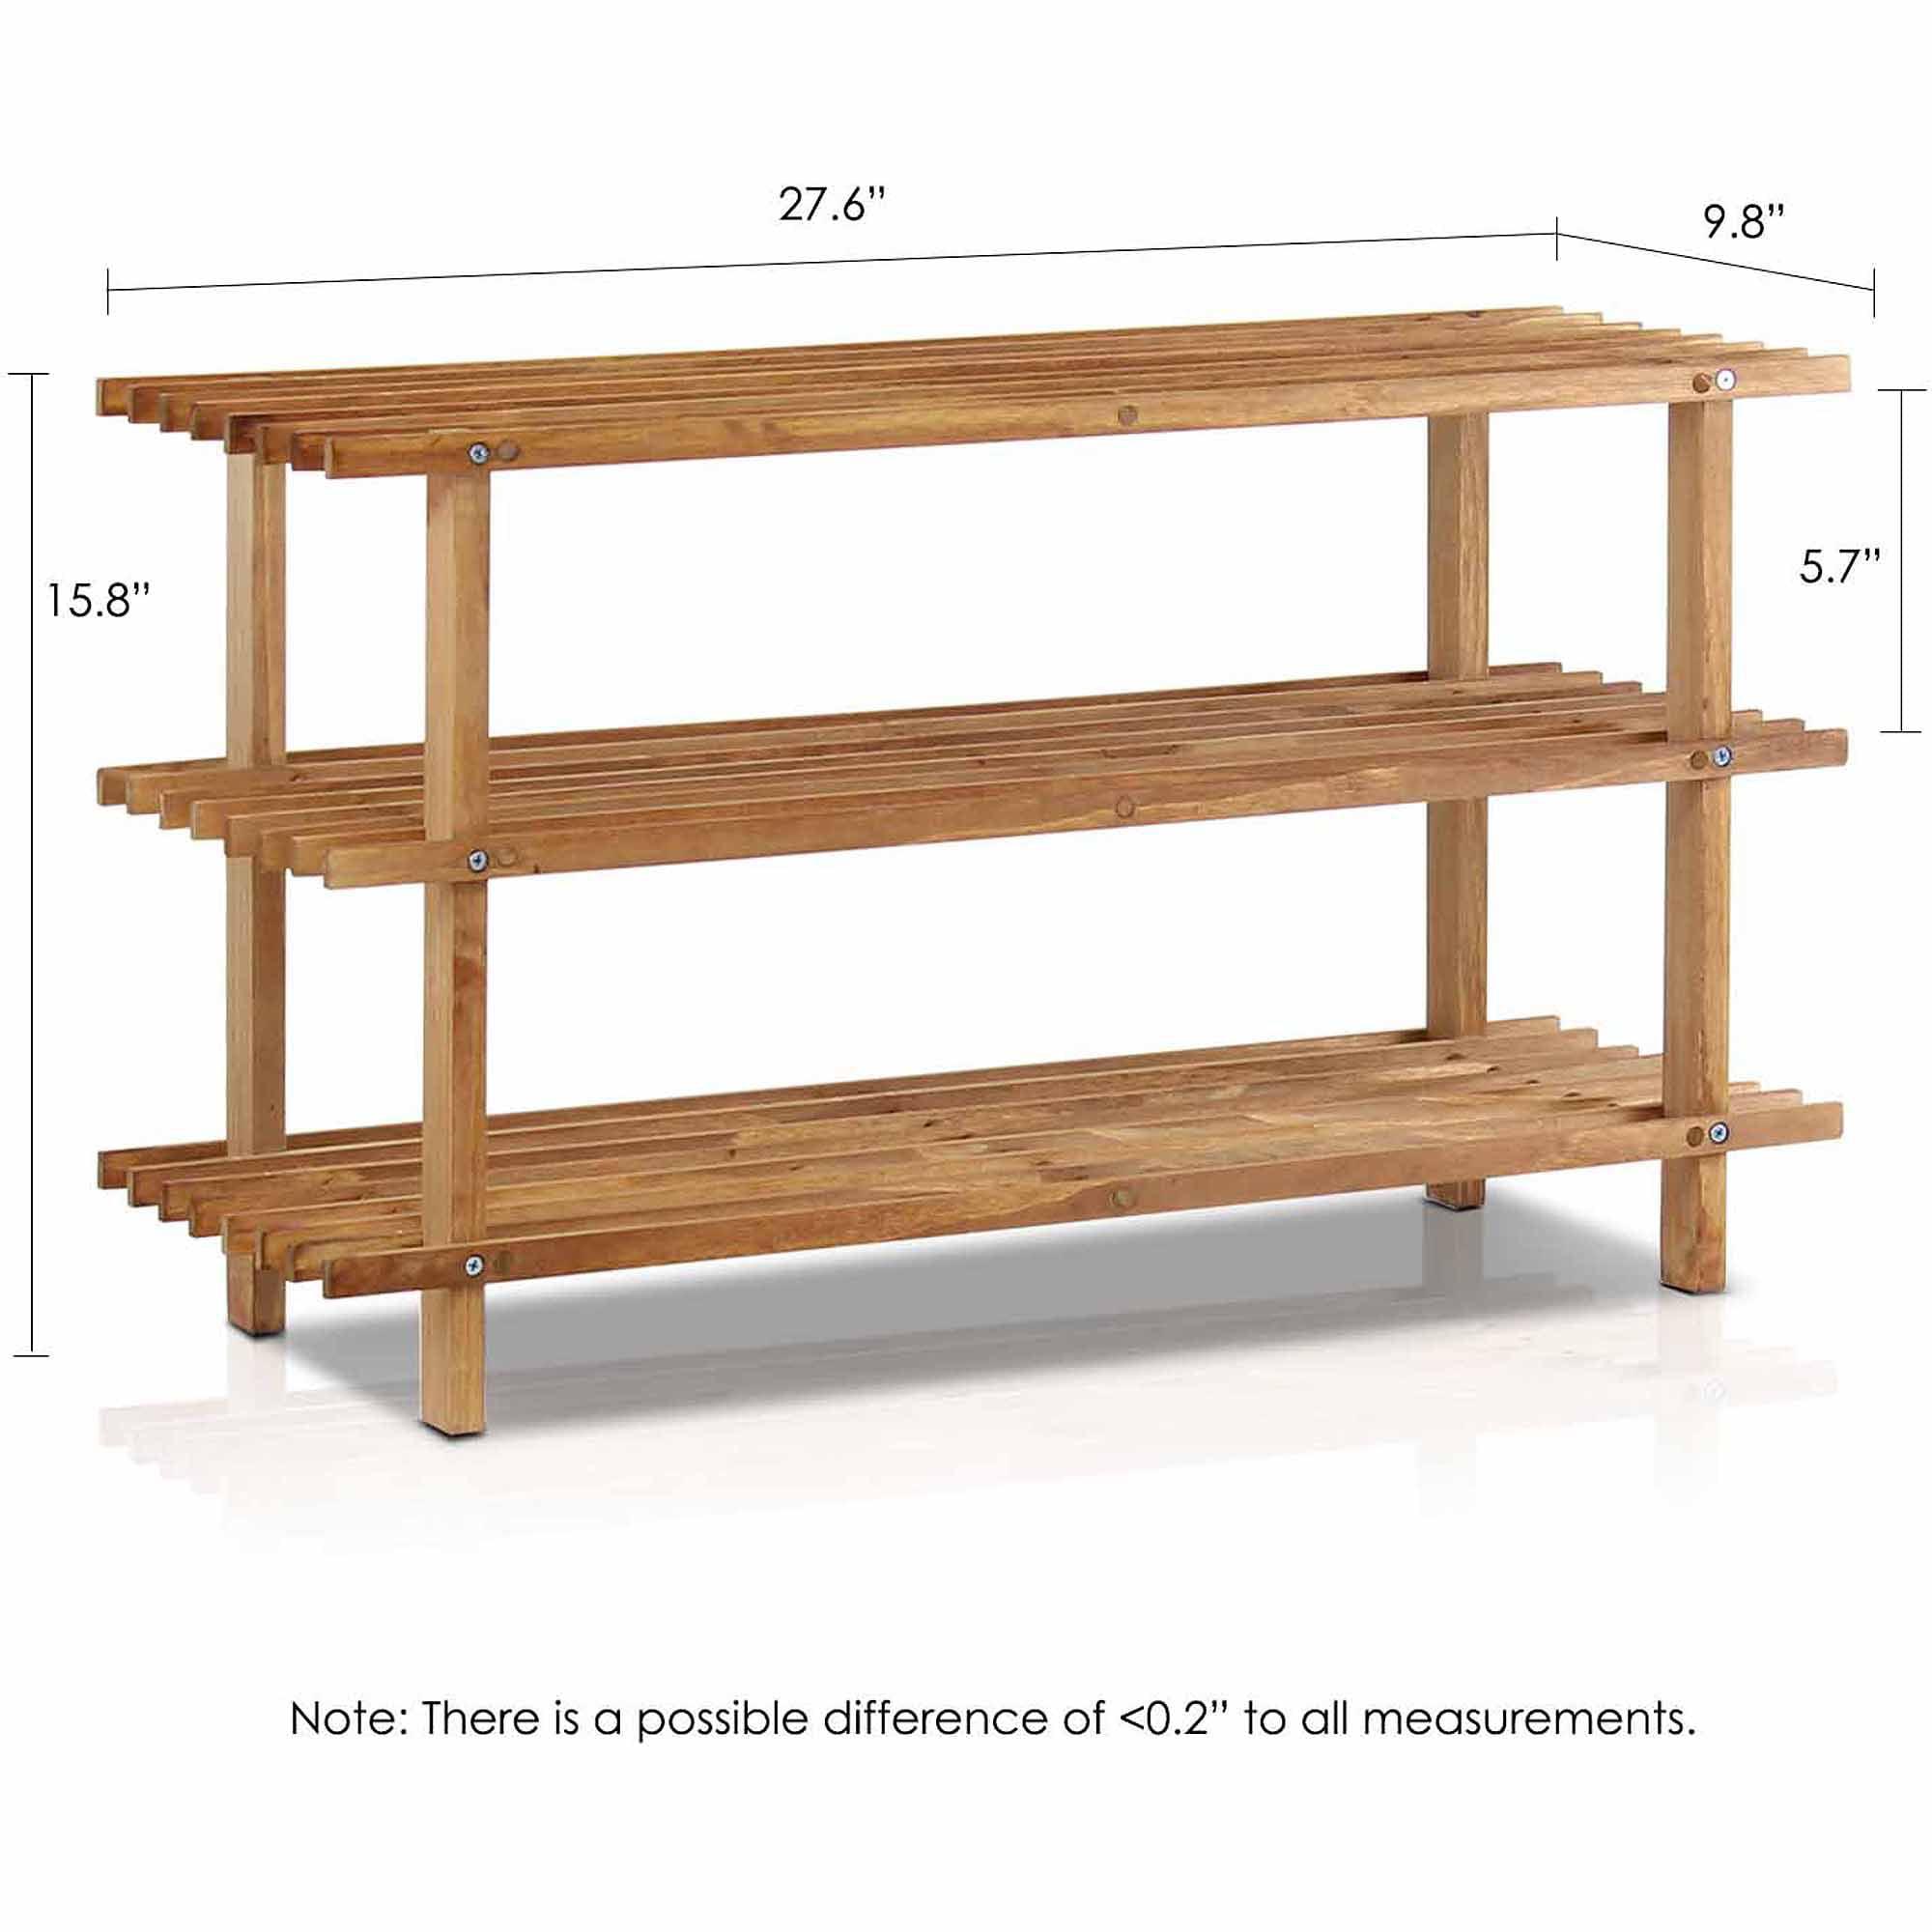 Furinno FNCJ-33003 Pine Solid Wood 3-Tier Shoe Rack